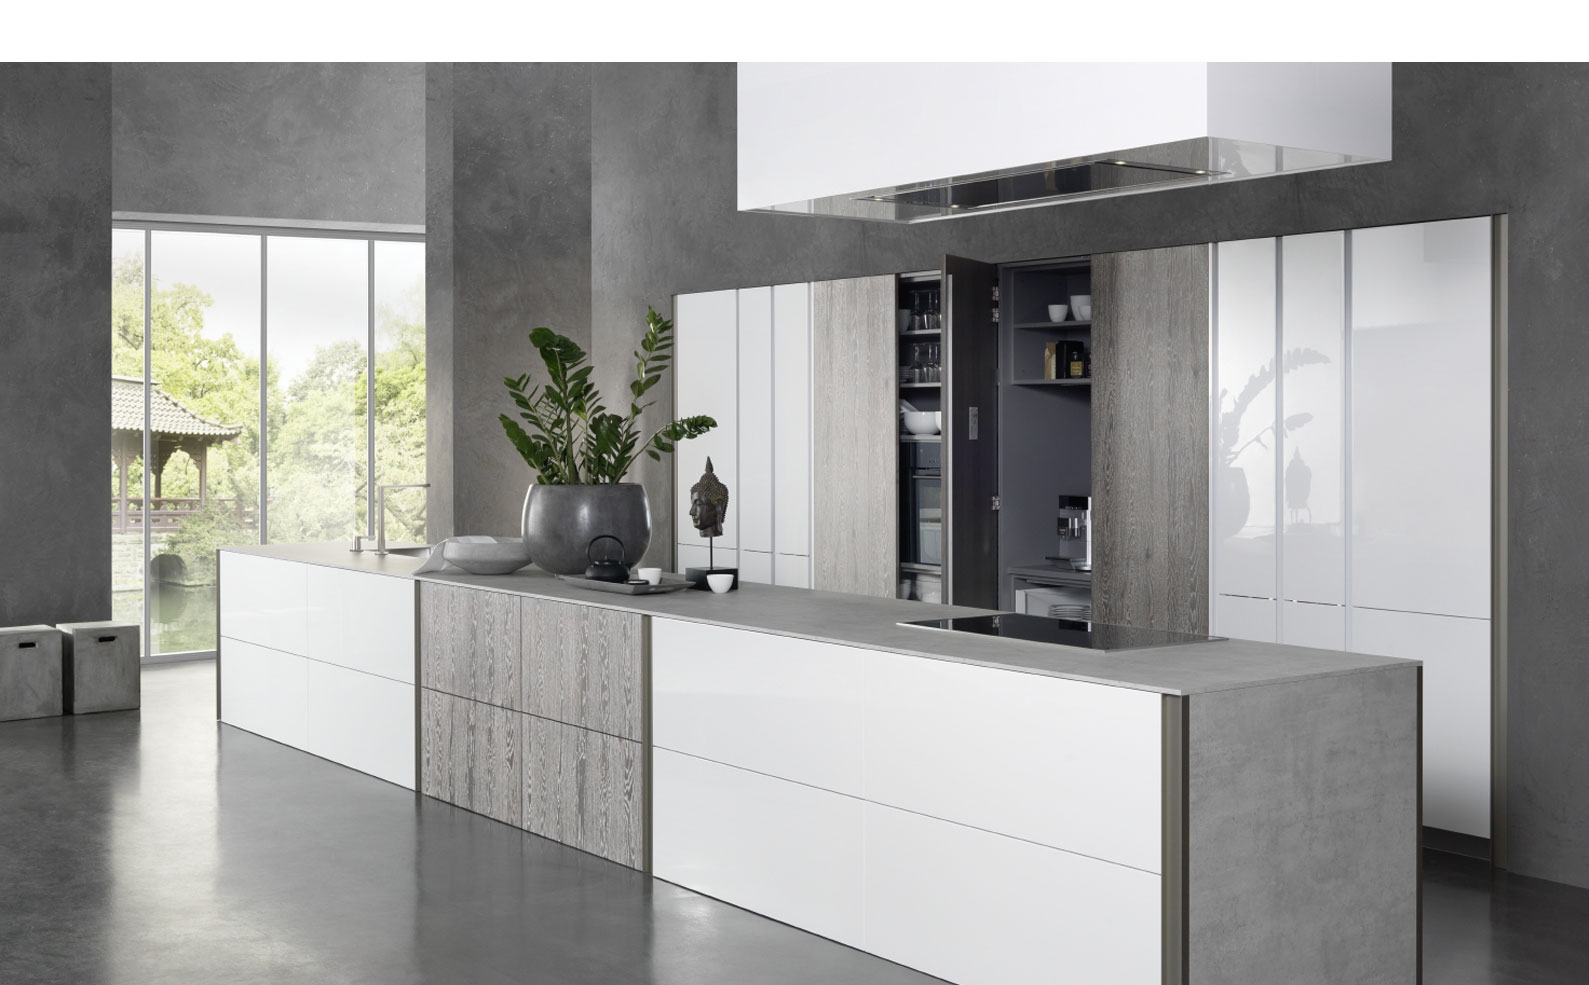 Rational keukens, Amsterdam Noord, Volendam, design keukens, installeren keukens, plaatsen keukens, schmidt, rotpunkt, keller,